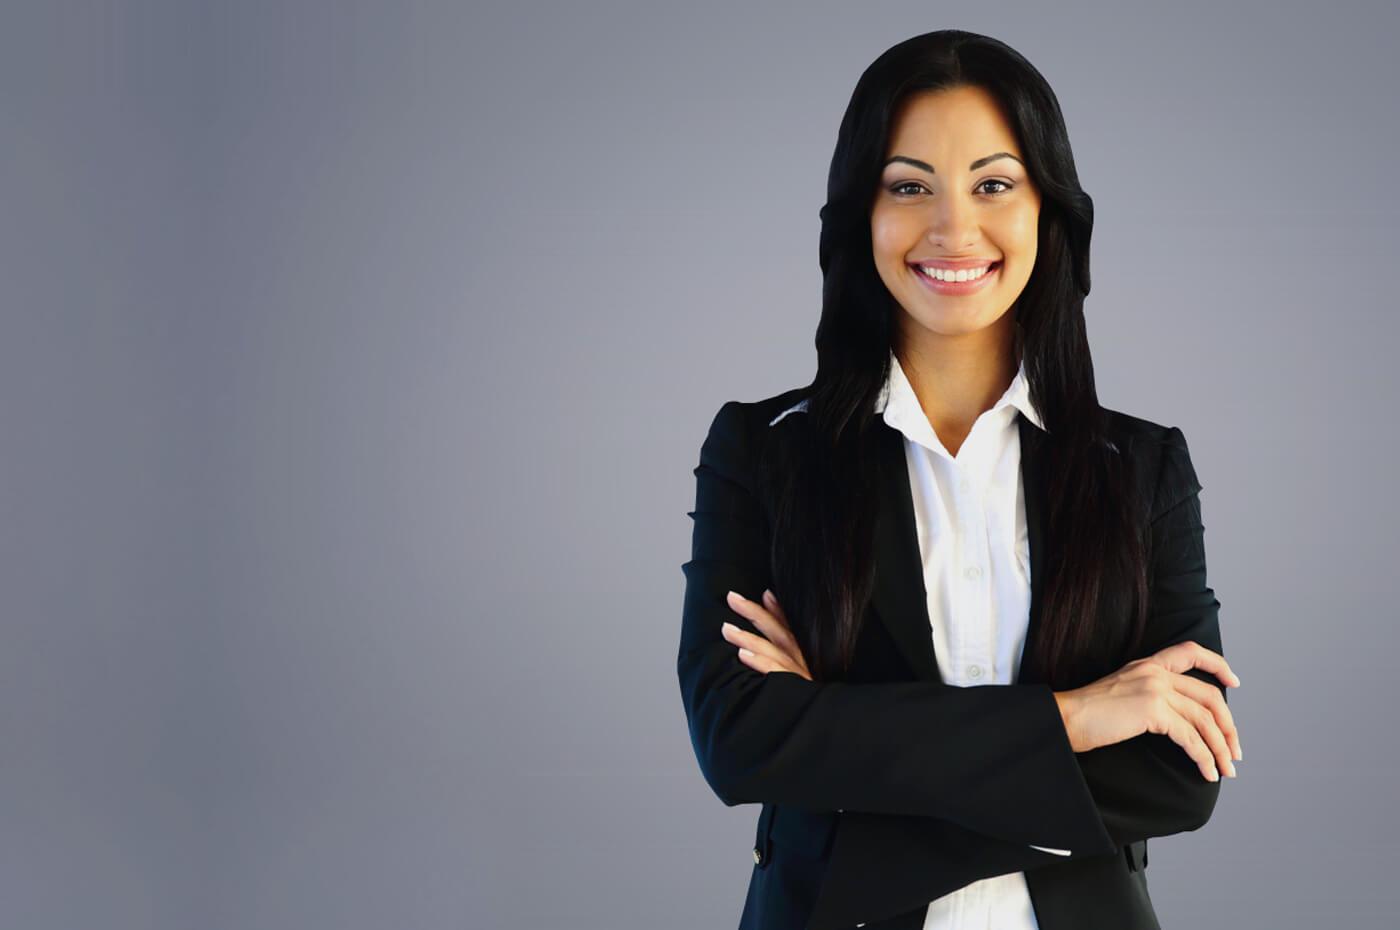 WE HELP BUSINESSESinnovate and grow